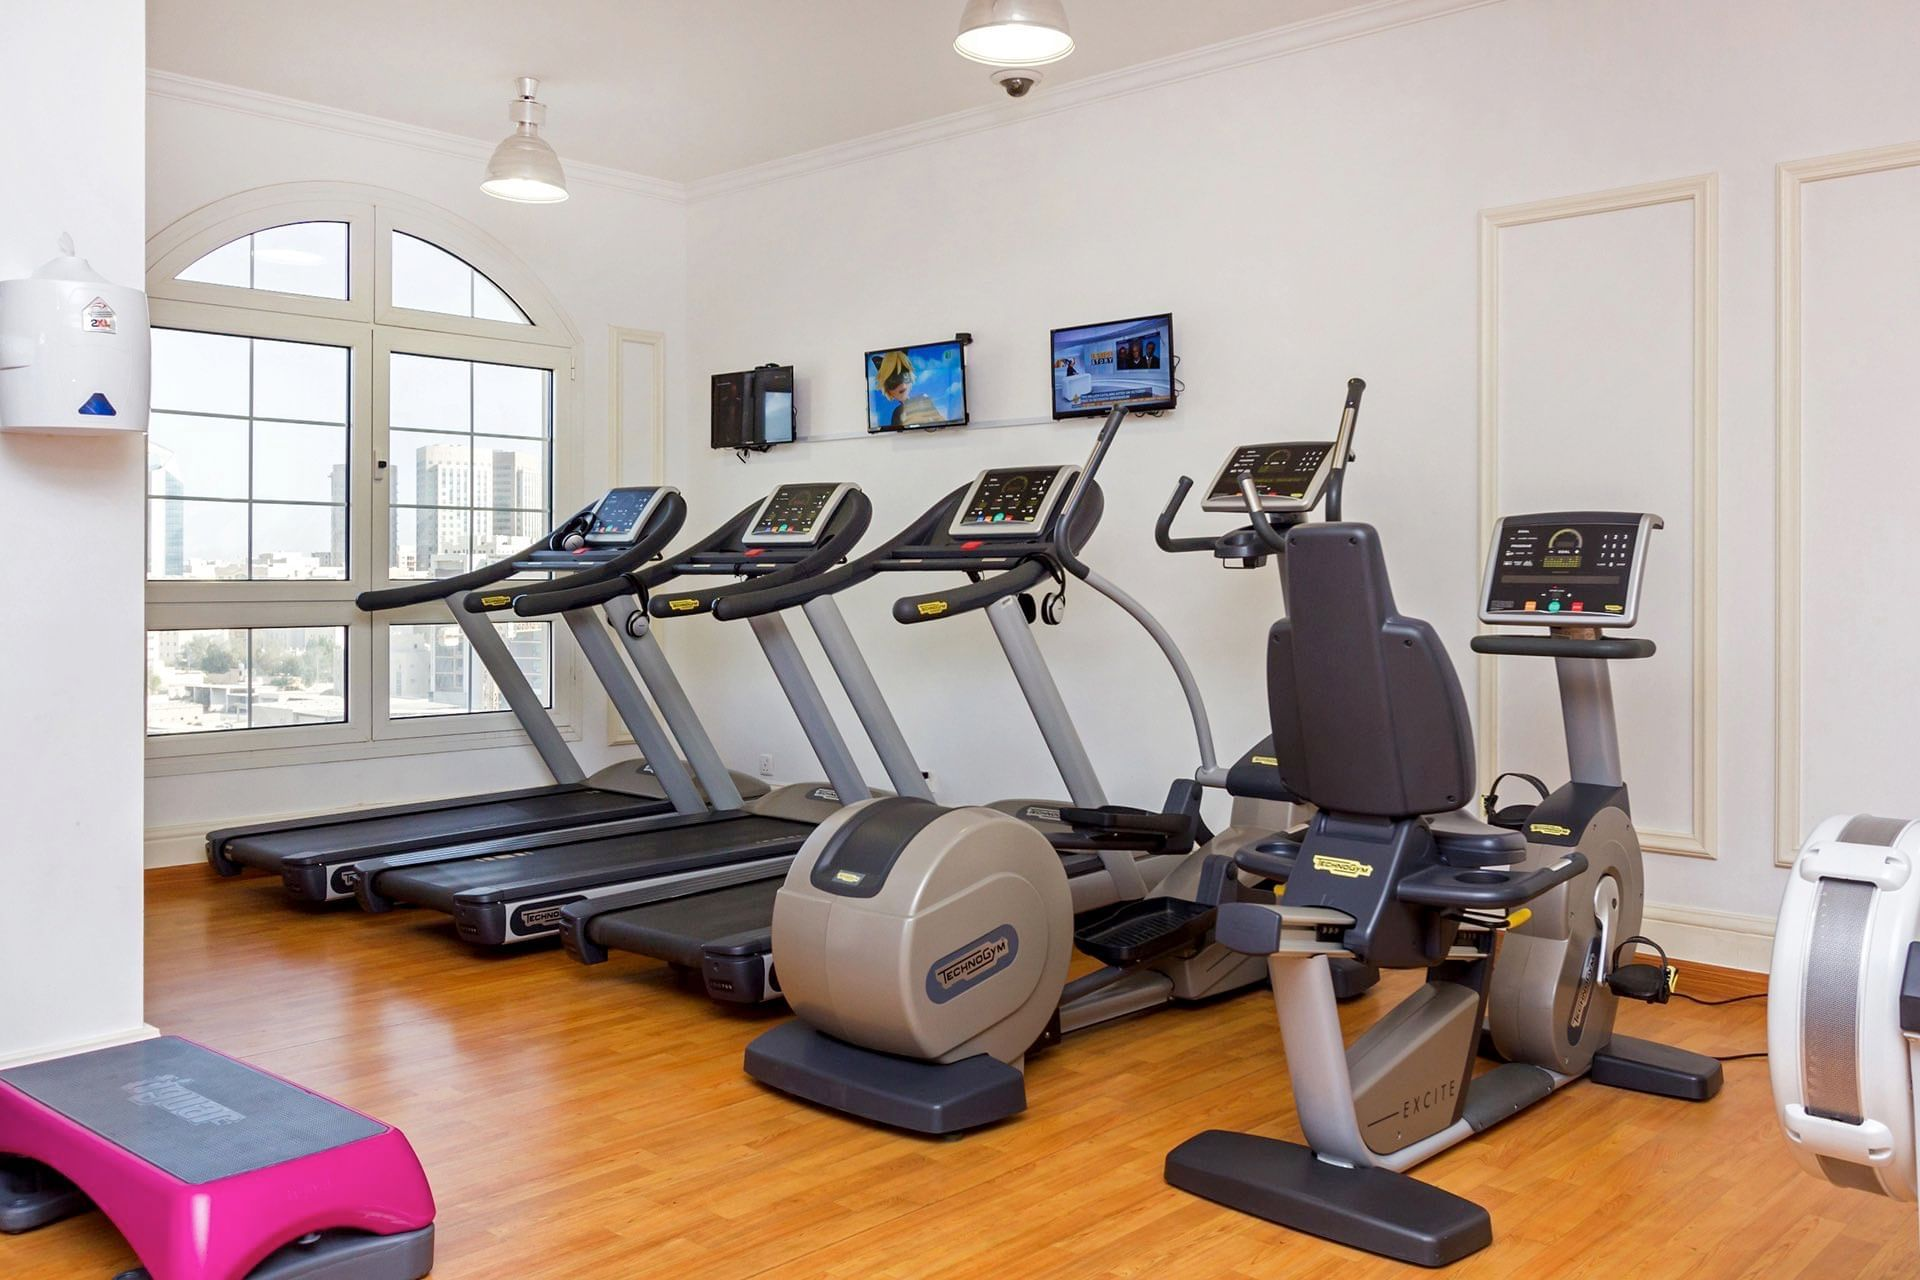 Fitness Machines at Warwick Doha